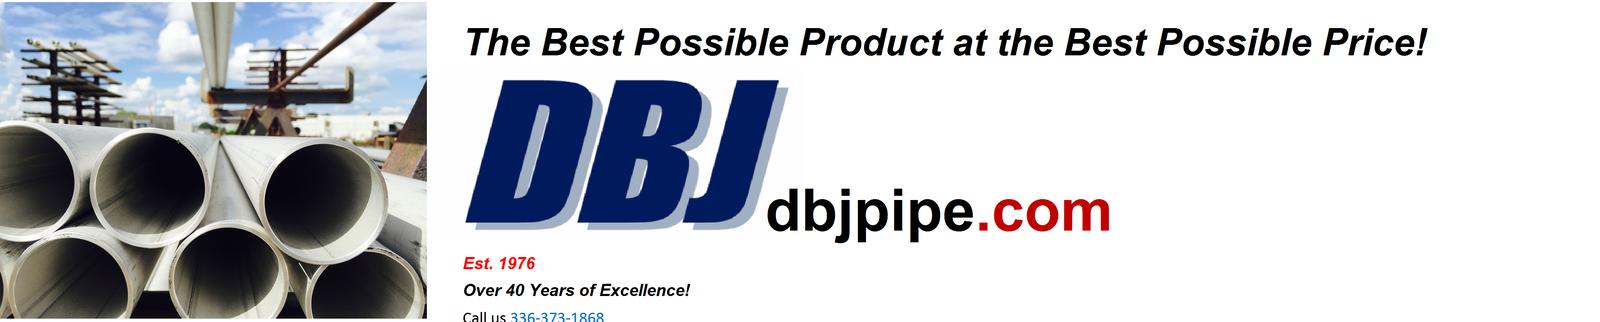 DBJ Corporation | Valves & Piping